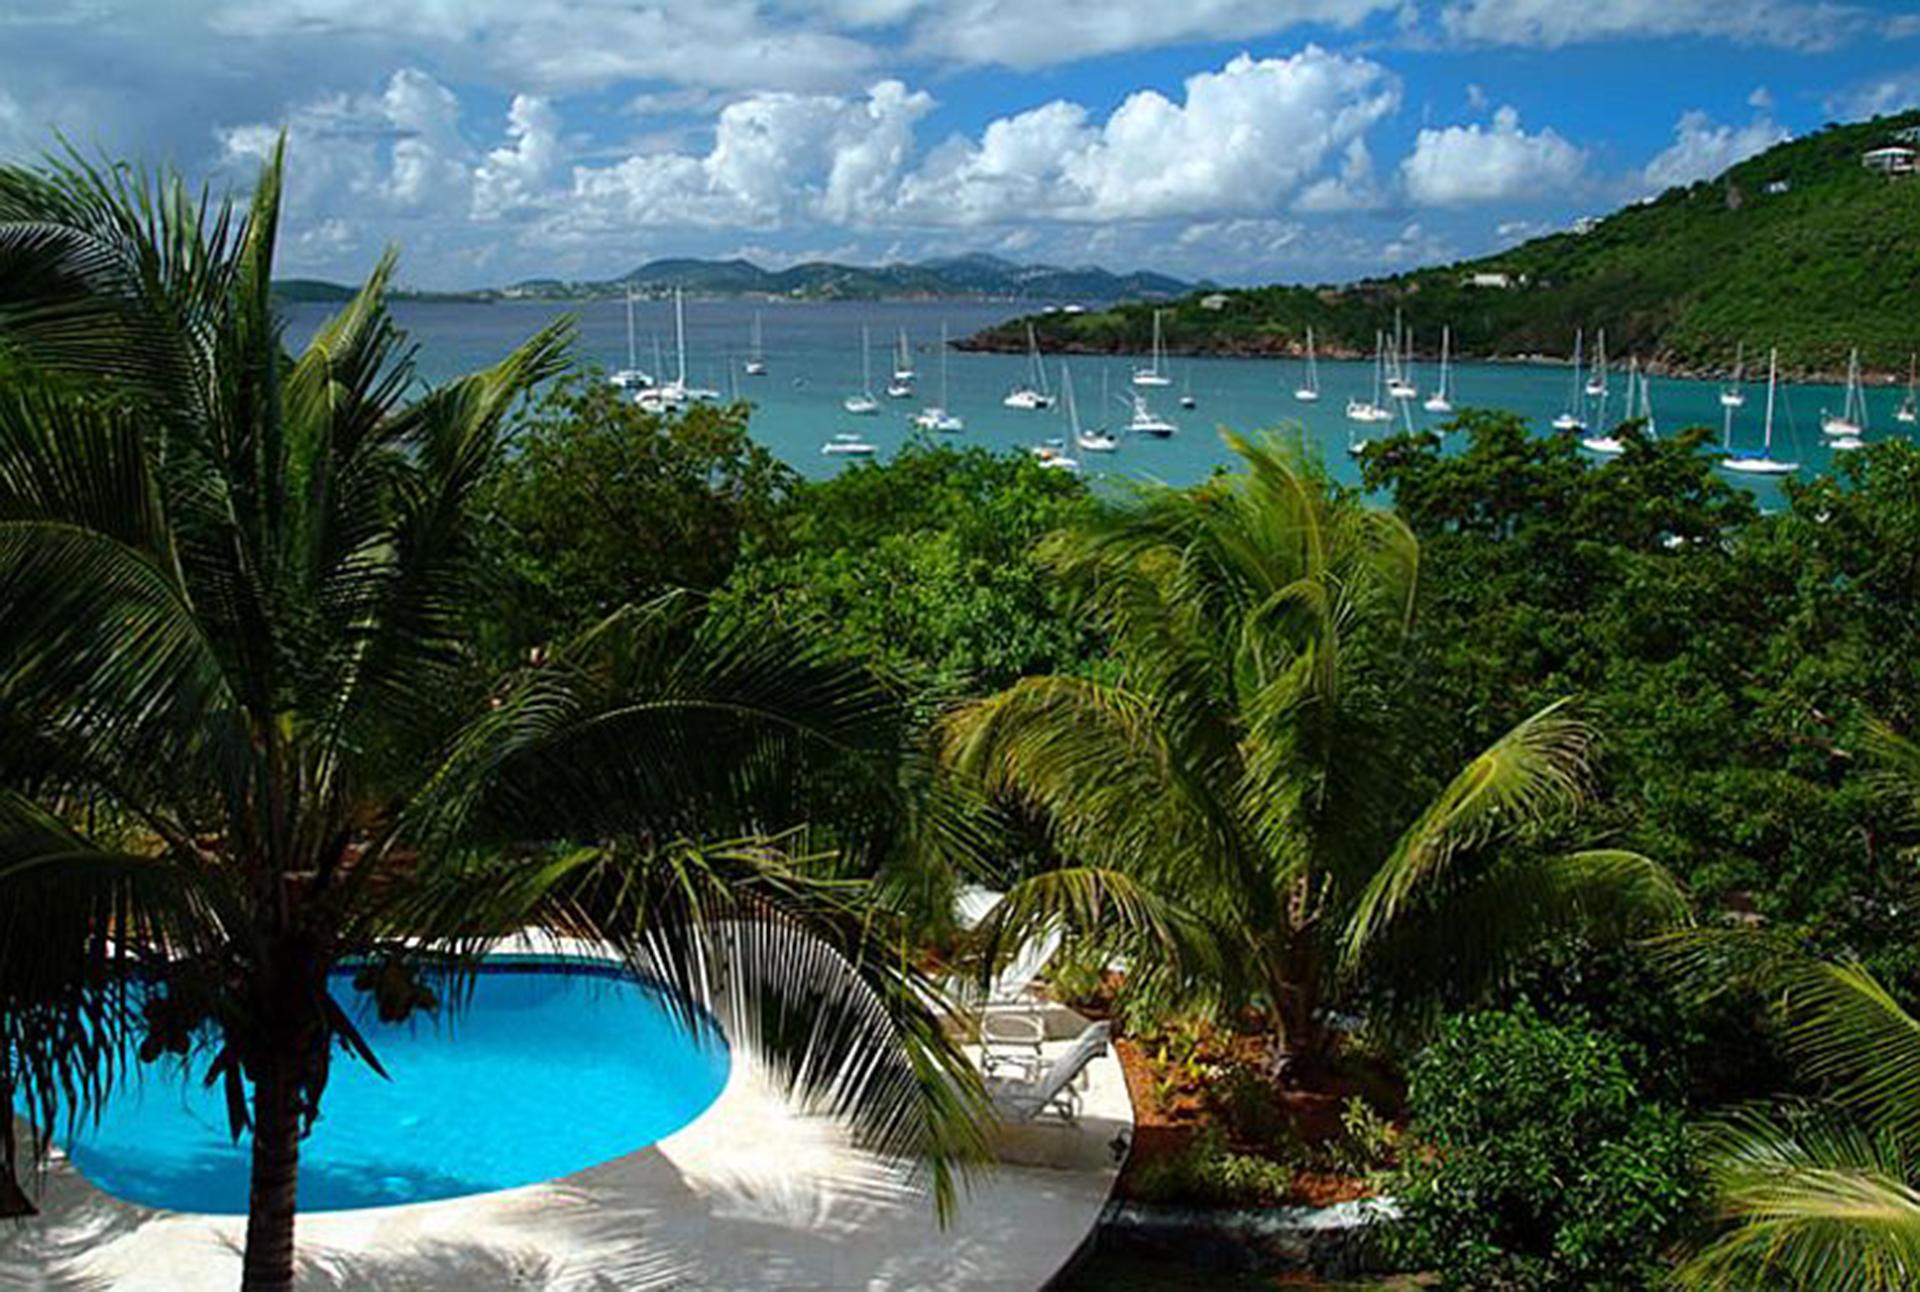 Pool-Great-Cruz-Bay-view.jpg